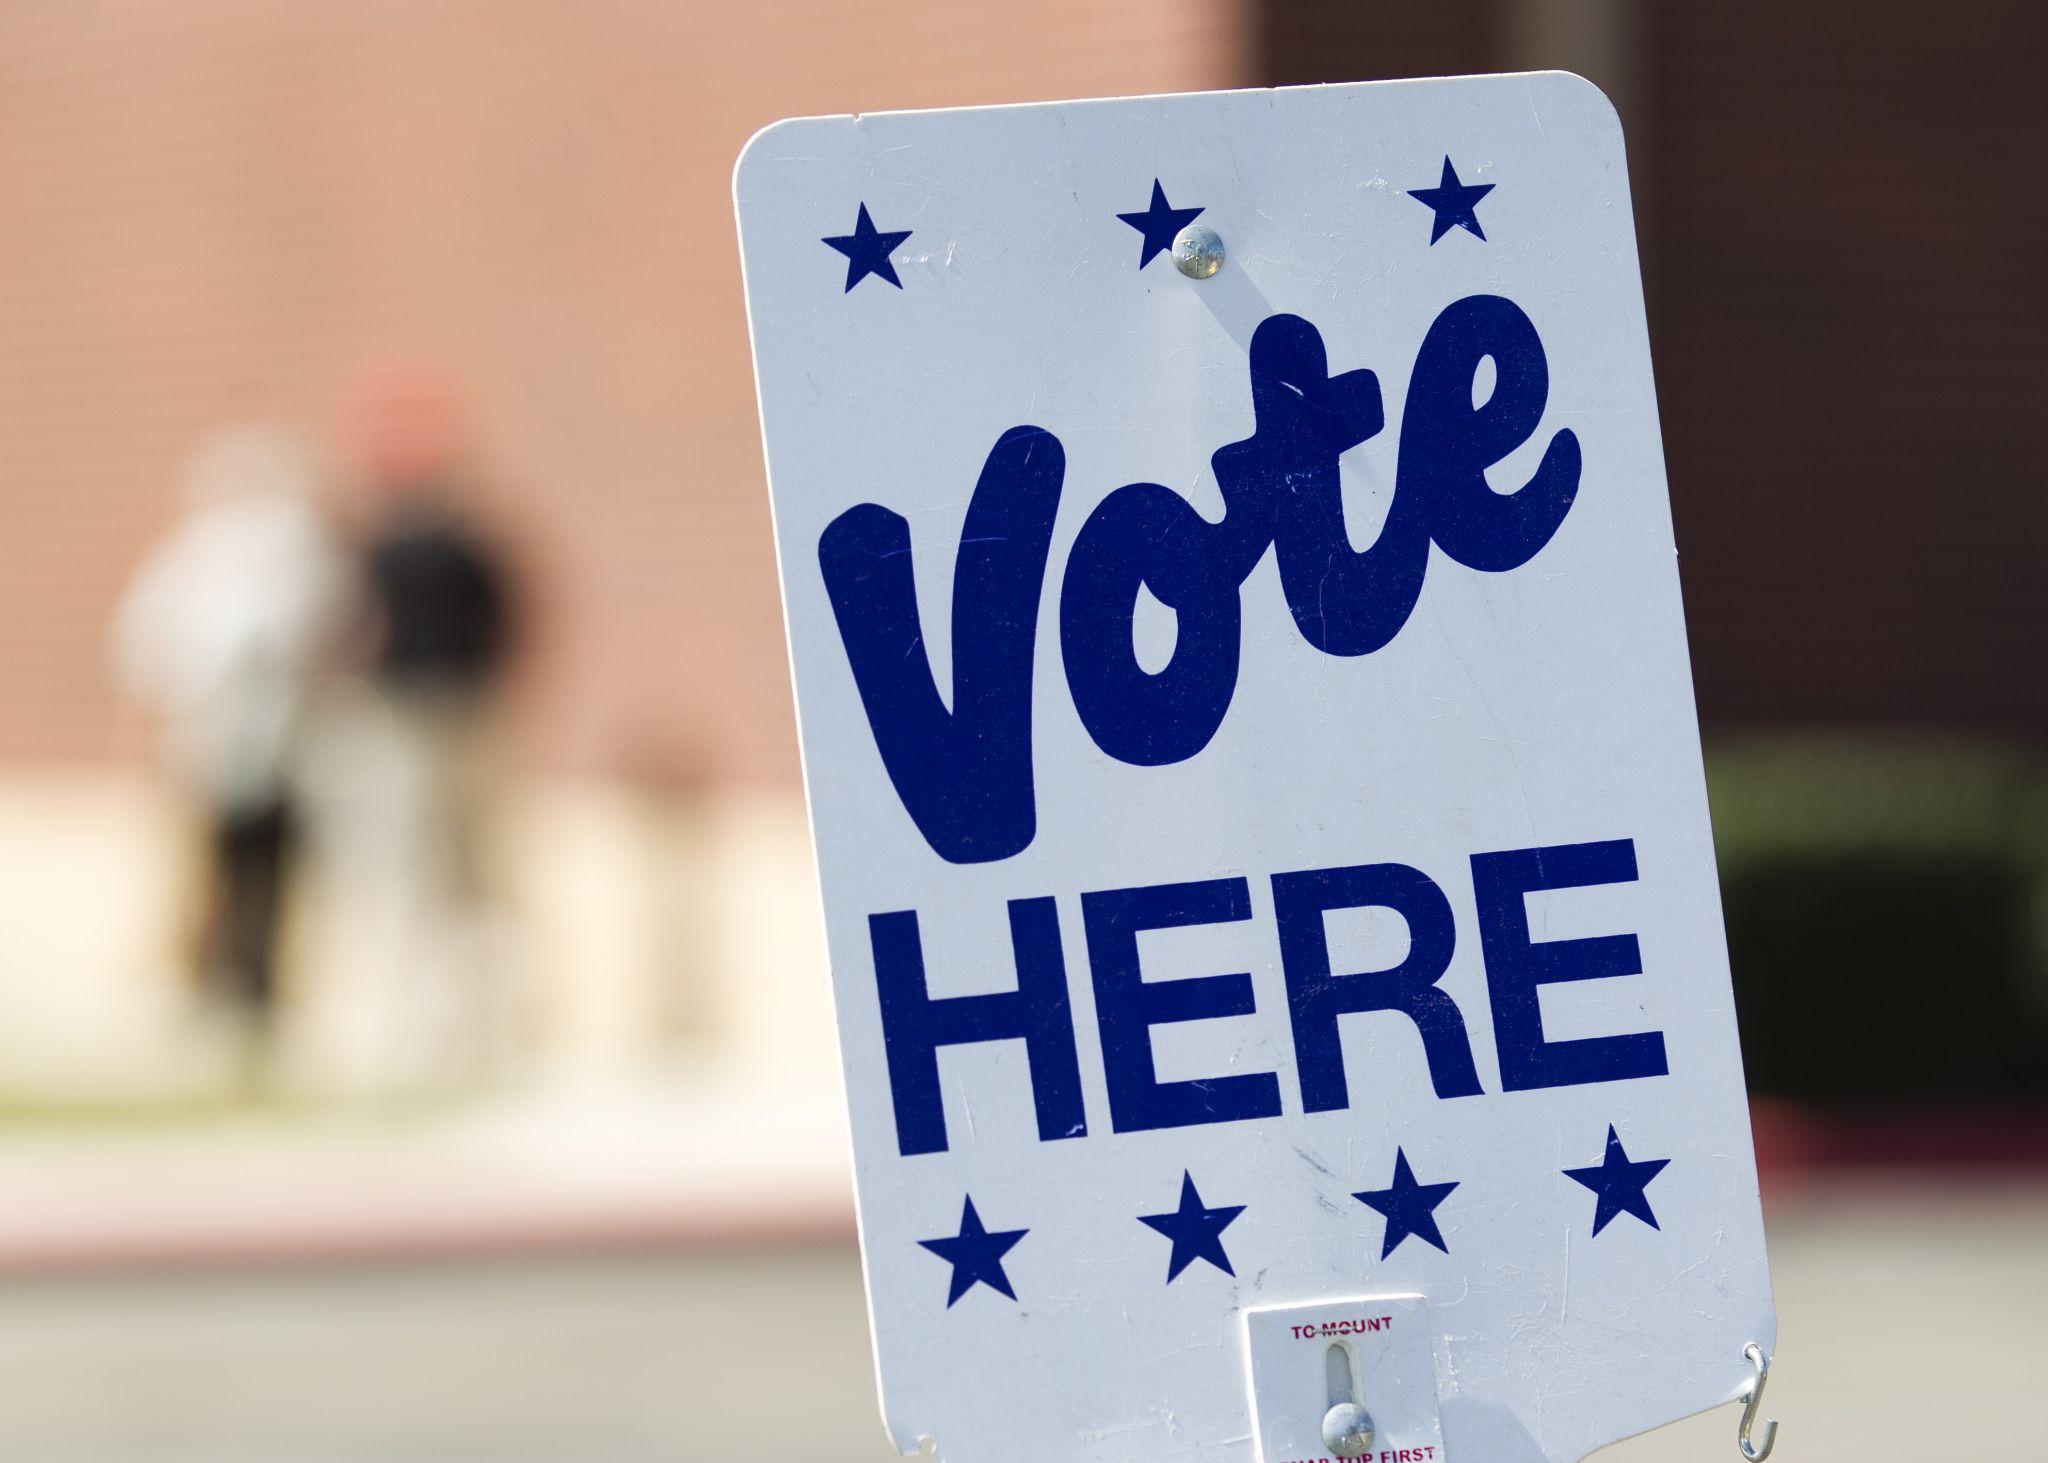 Thursday marks deadline to register to vote in December runoffs